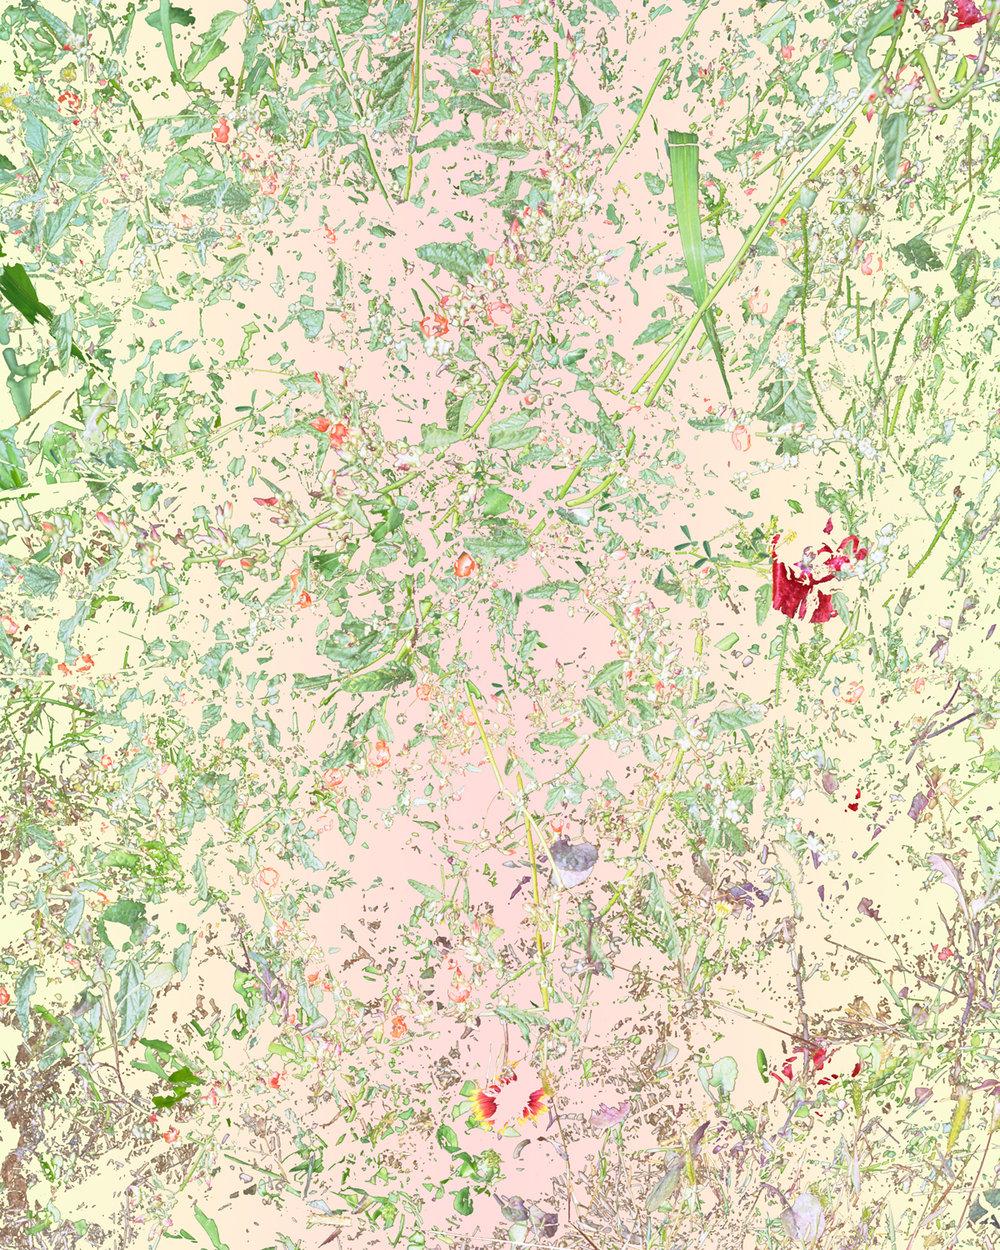 Wildflowers-PVGM3-31.25x25.jpg